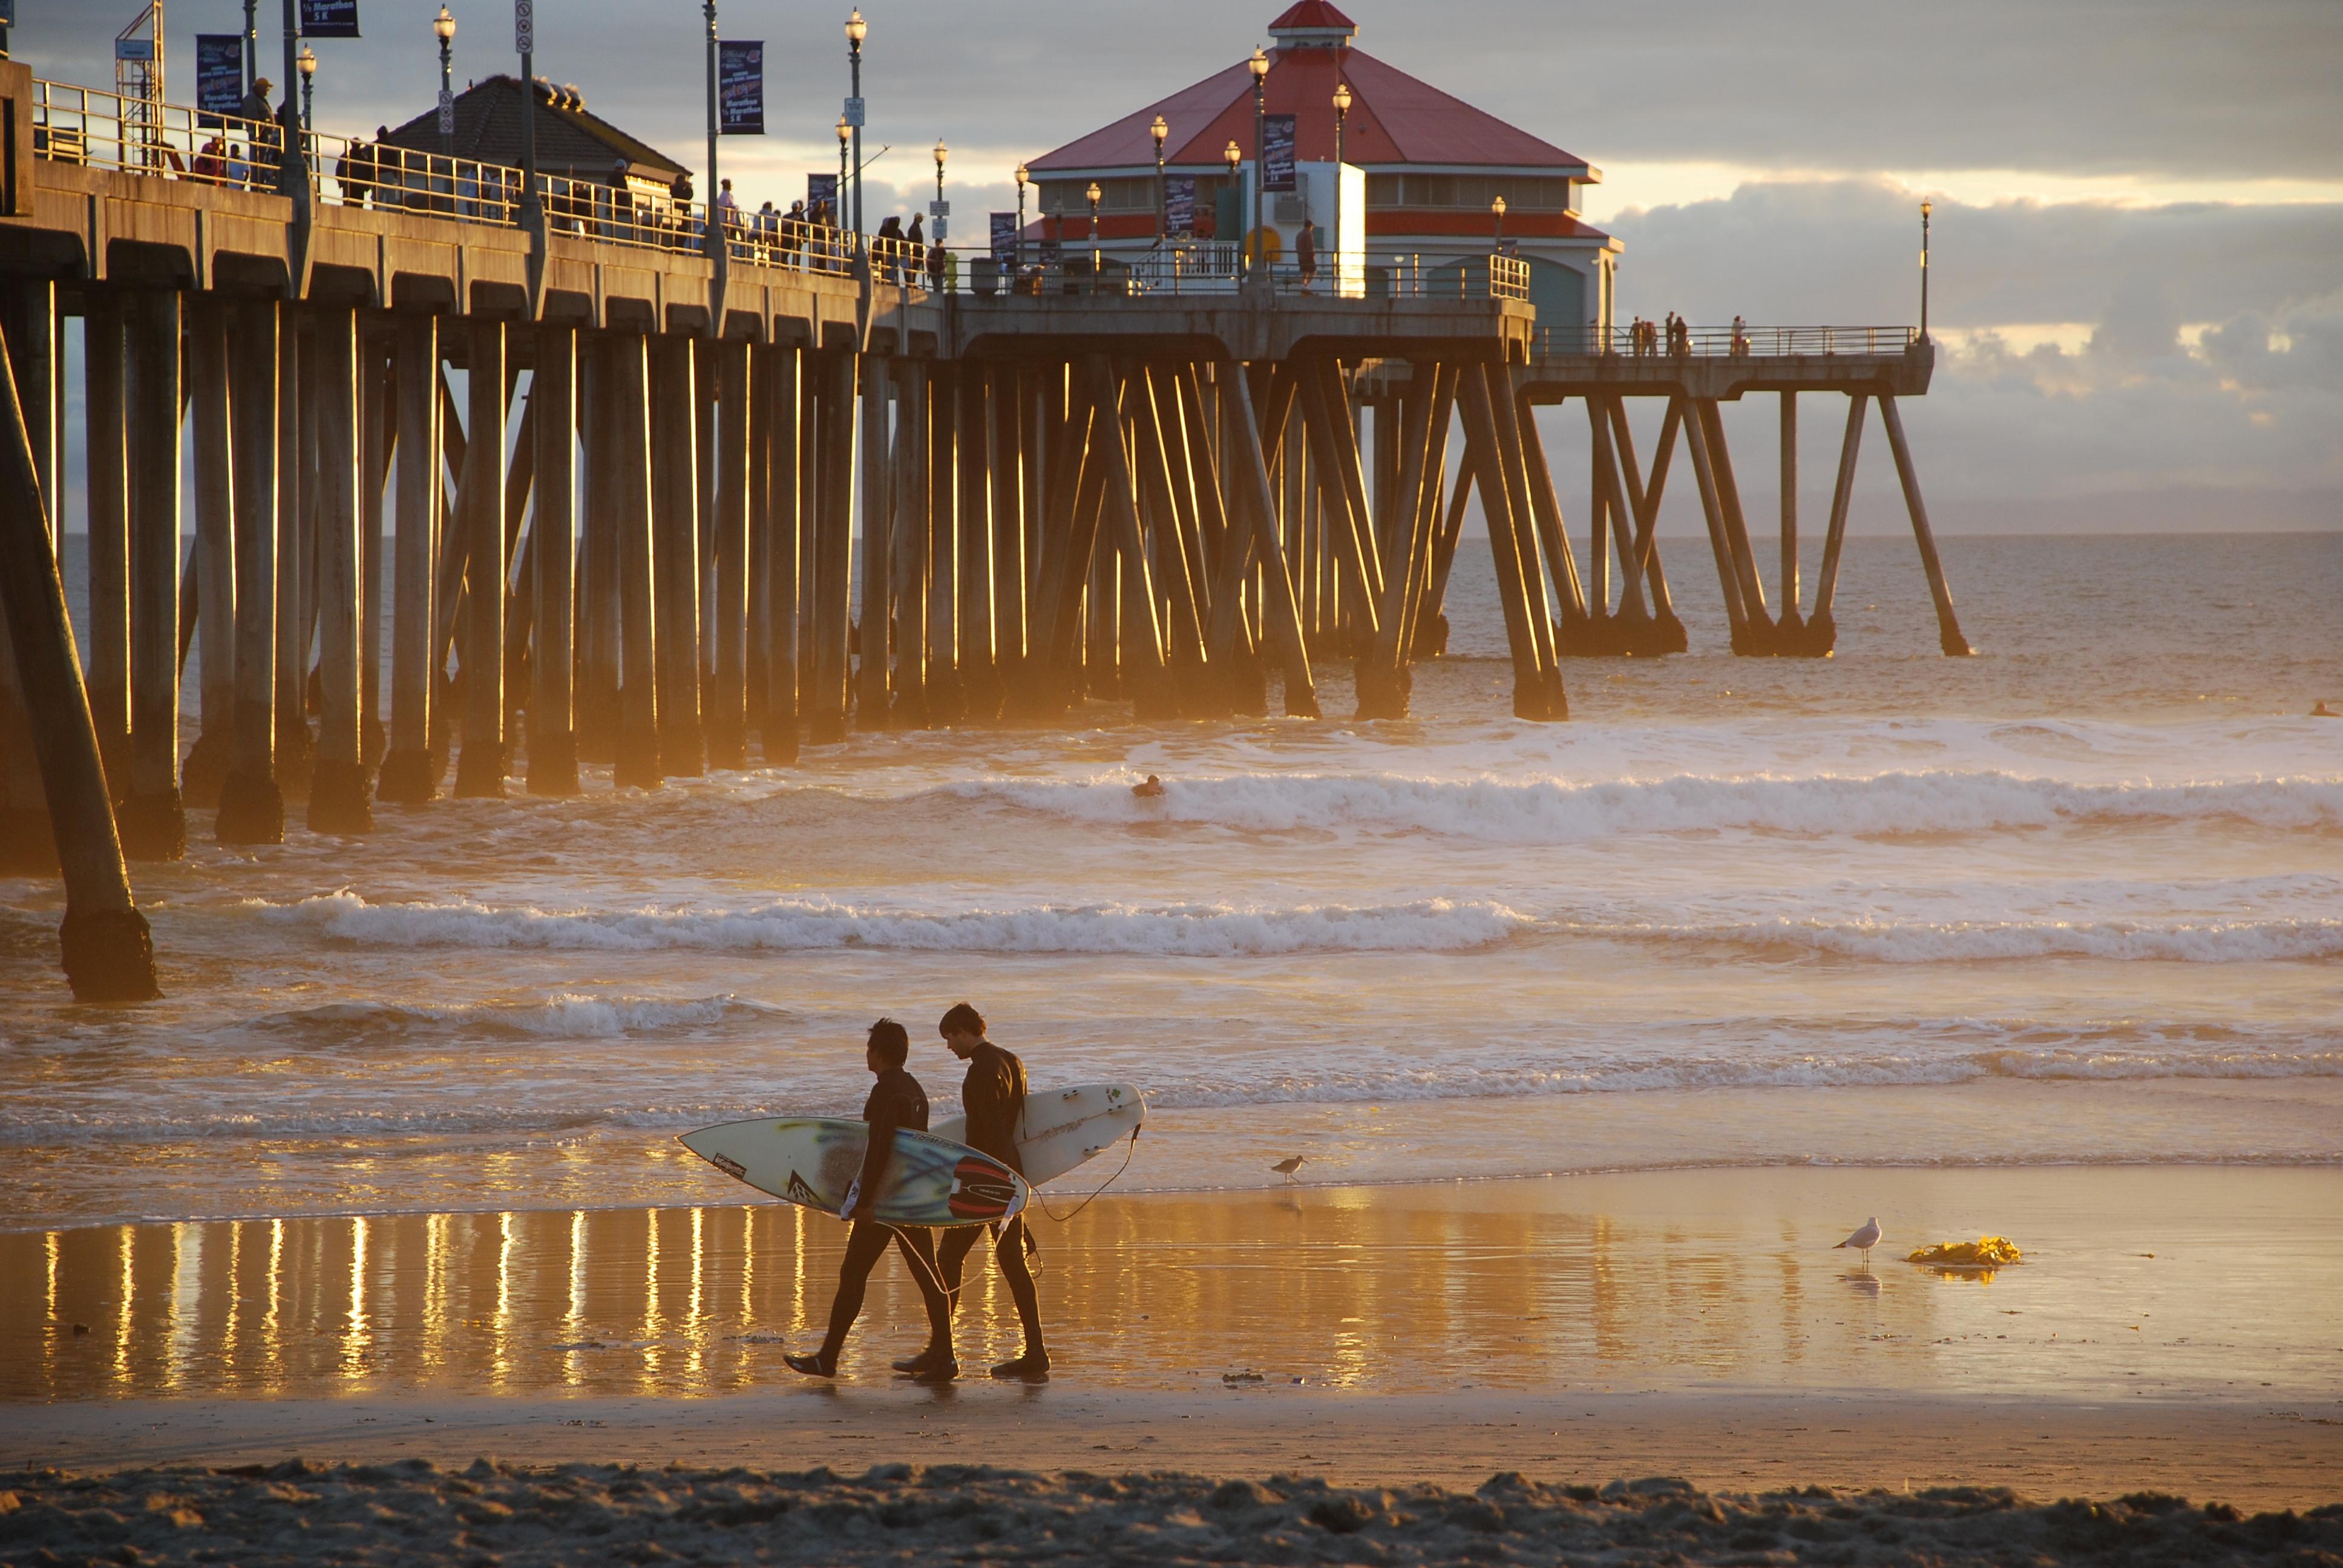 California Sunset Reflection Beach Water Pier Sand Waves Surfing Surfers Oc Huntingtonbeach Hb Feelsgood Thisfeelsgood